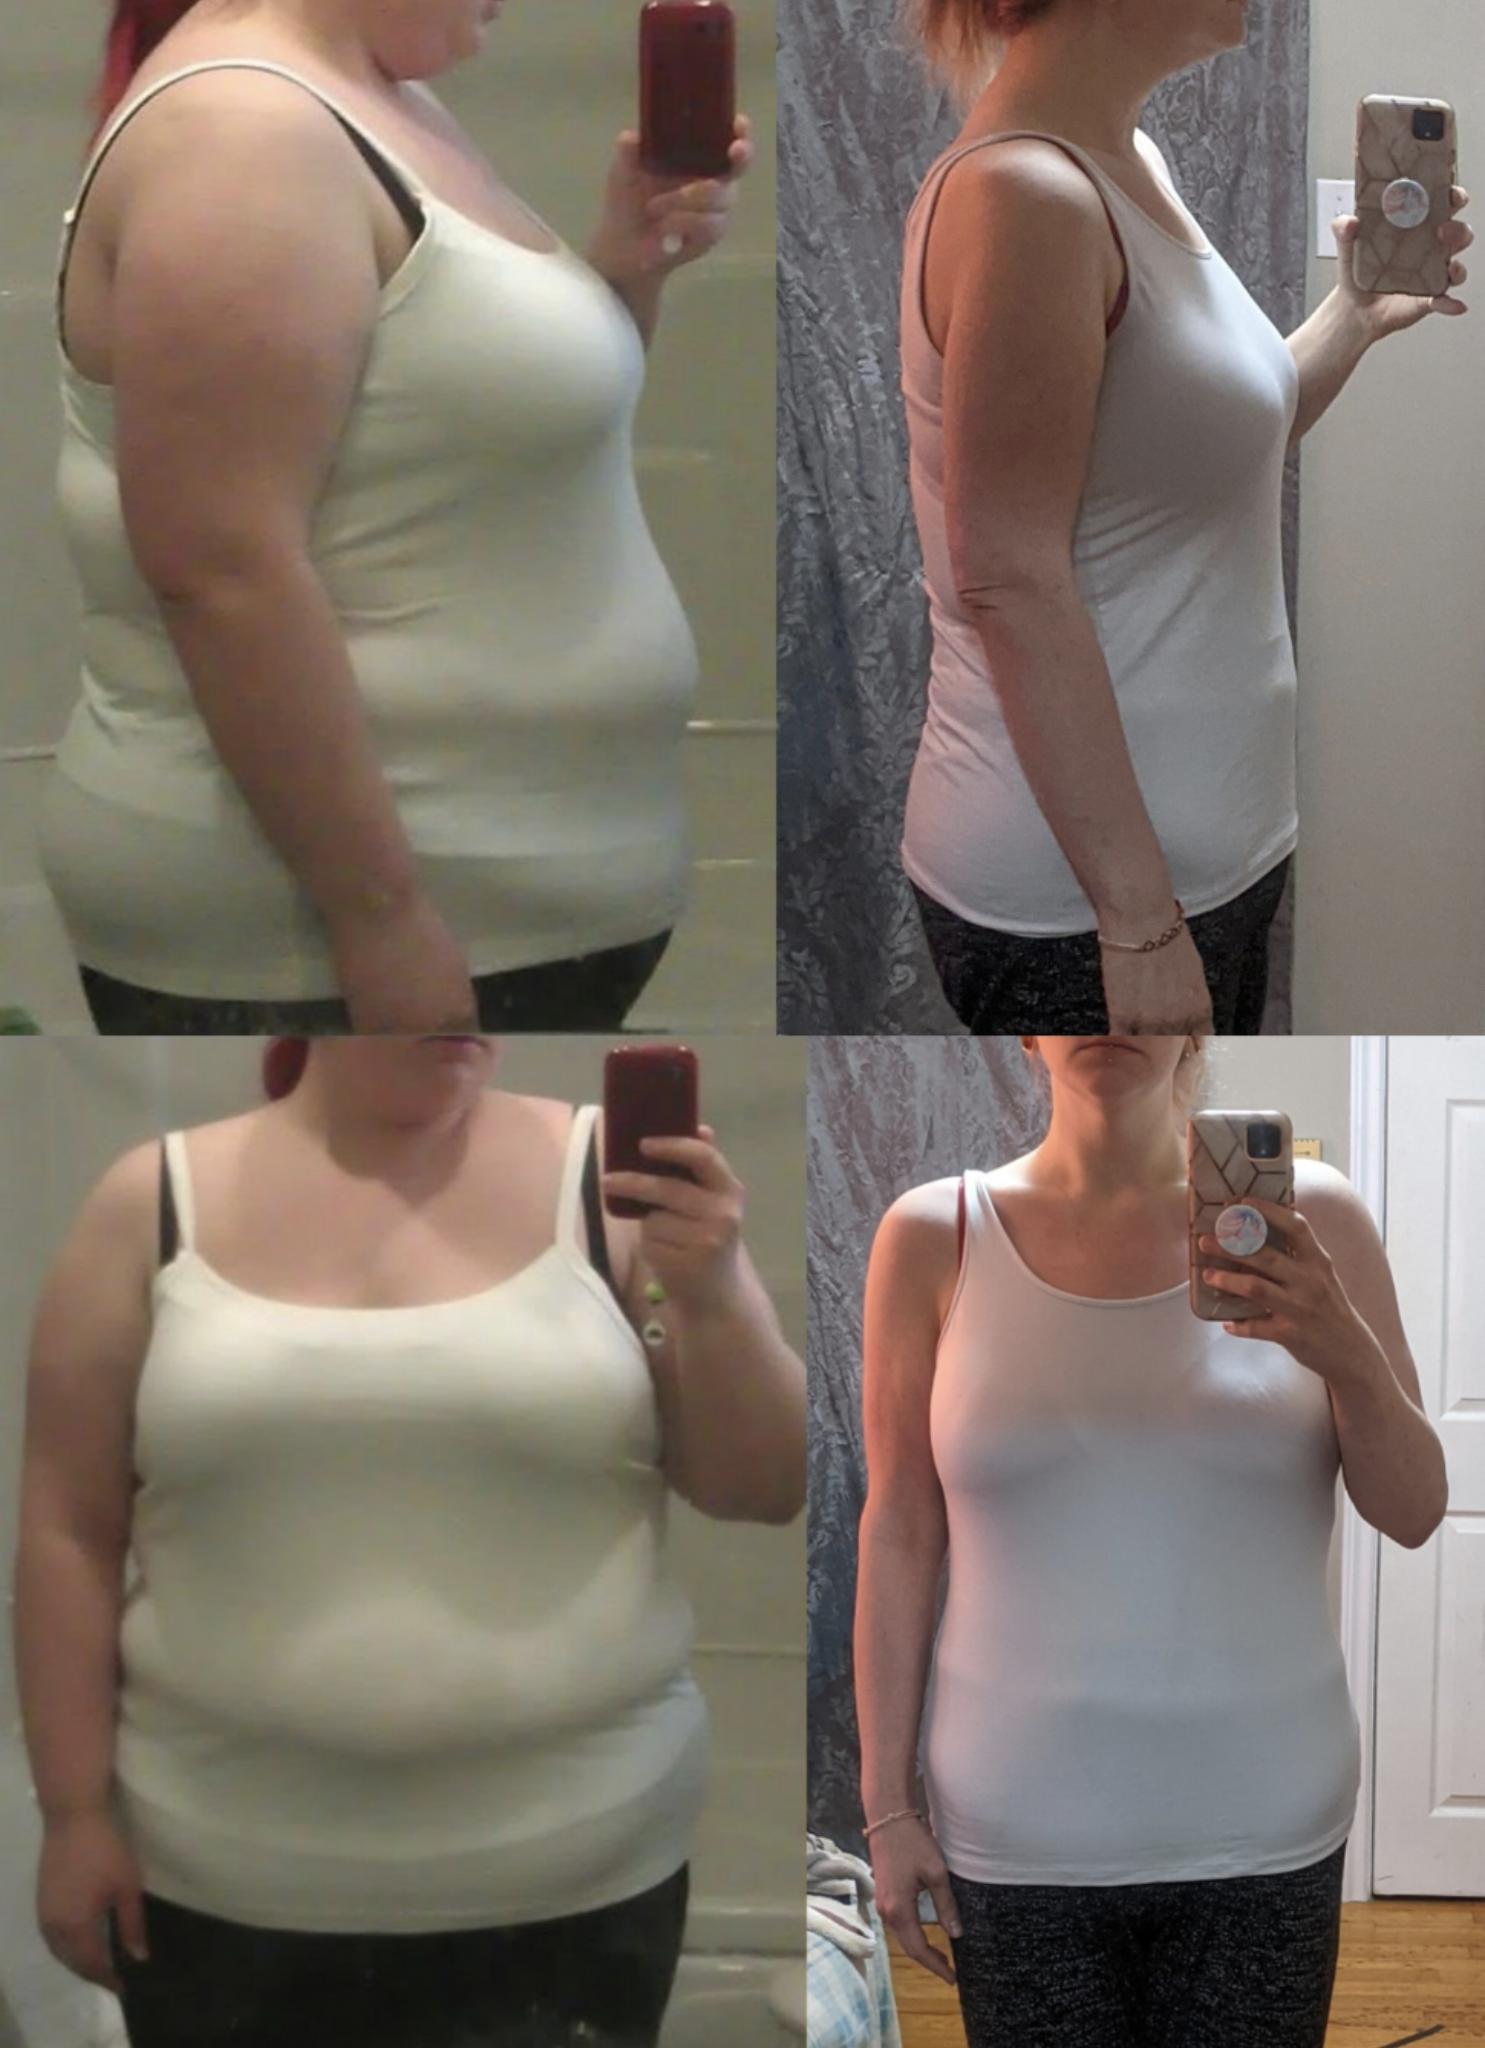 5 feet 8 Female Progress Pics of 150 lbs Weight Loss 335 lbs to 185 lbs